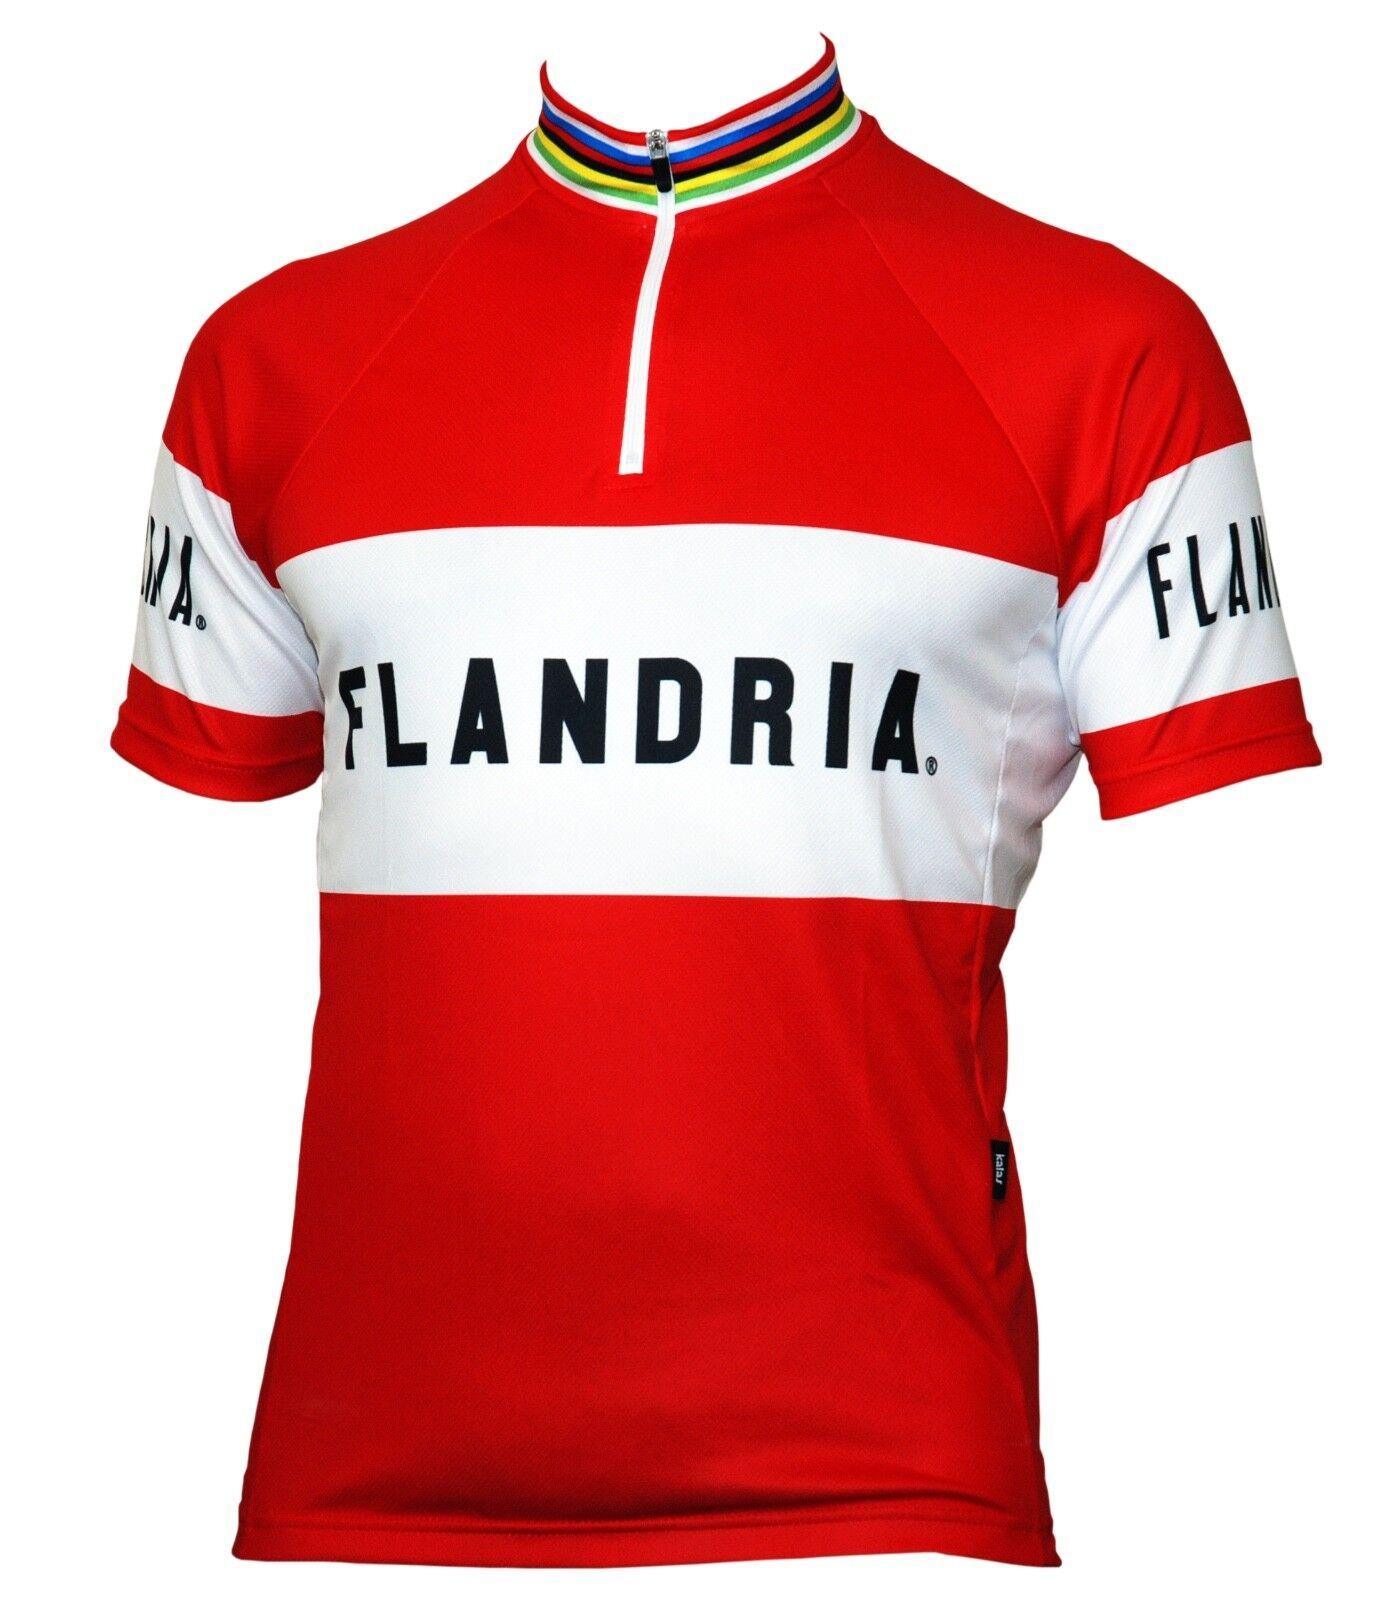 Genuine FLANDRIA Short Sleeve Cycling Jersey - Retro Design - New